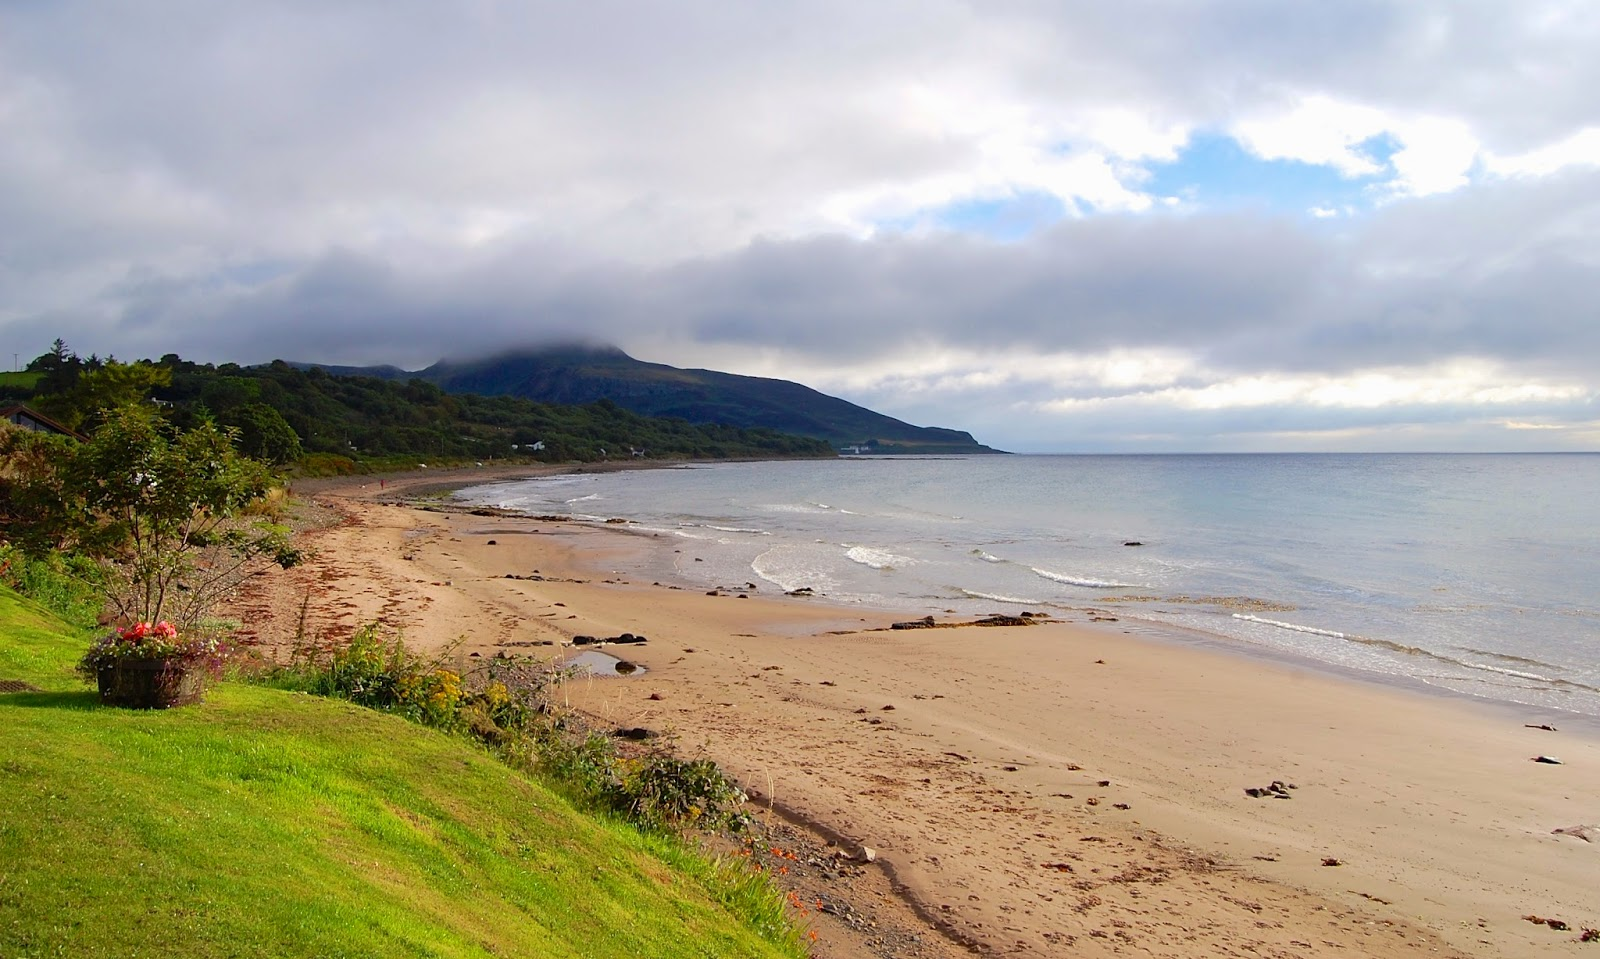 Whiting Bay beach